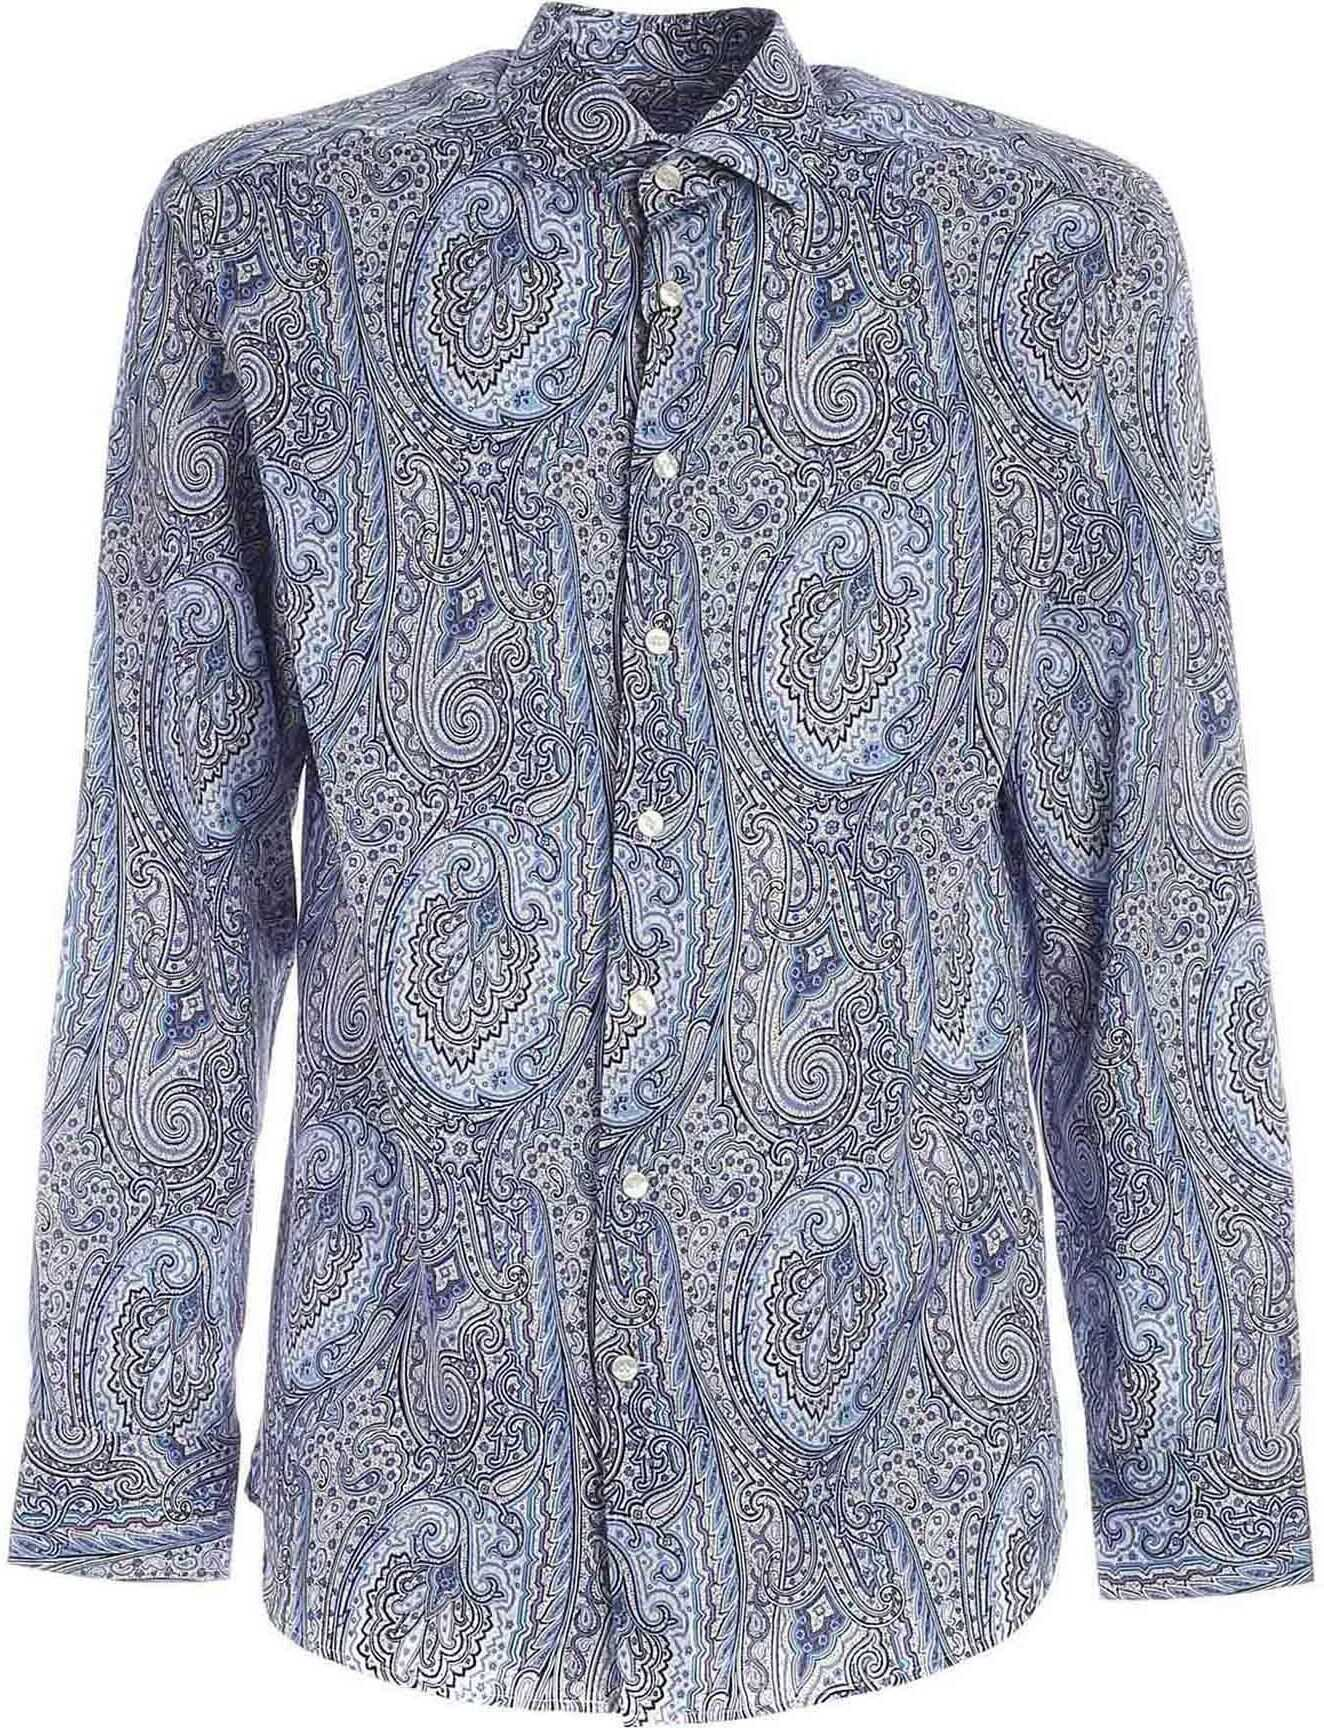 ETRO Paisley Pattern Shirt In Blue Blue imagine